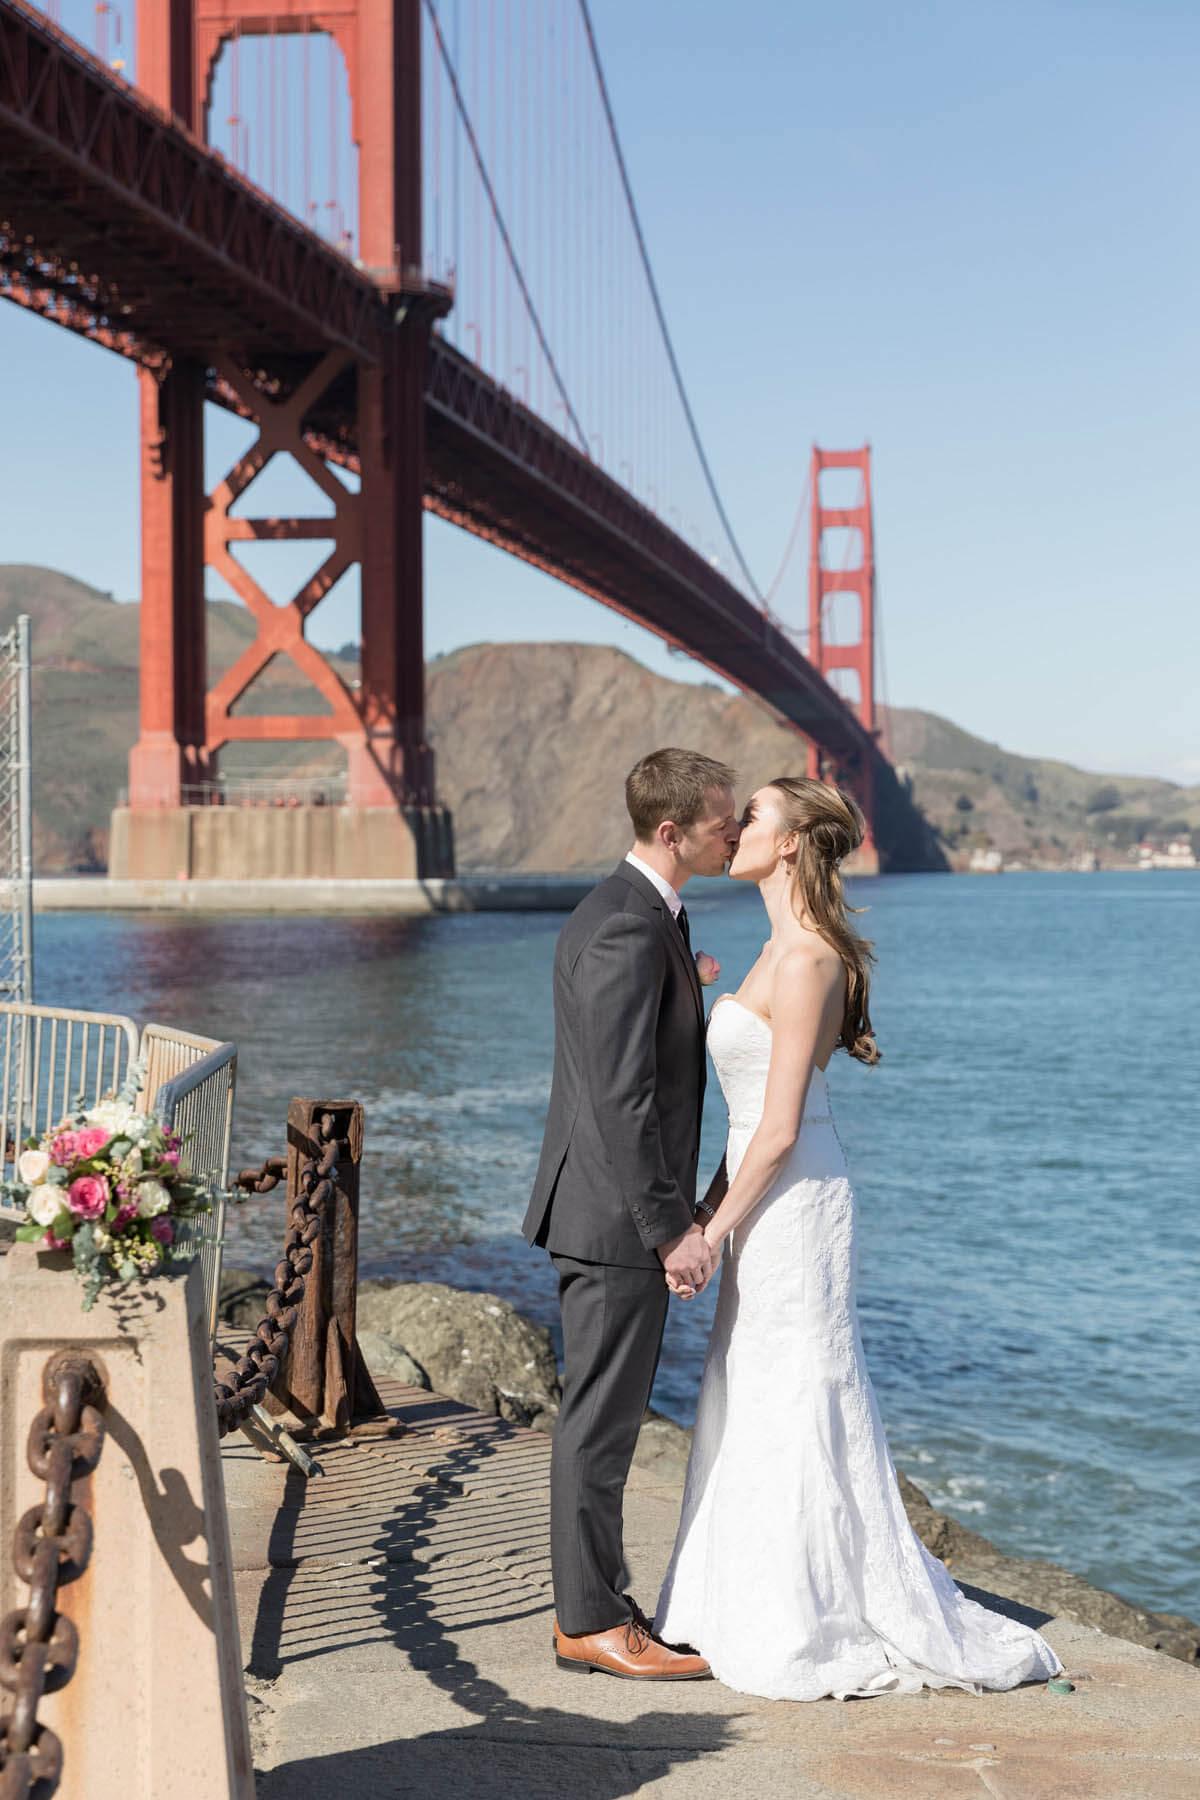 Tasha and Seth's San Francisco elopement - Golden Gate Bridge